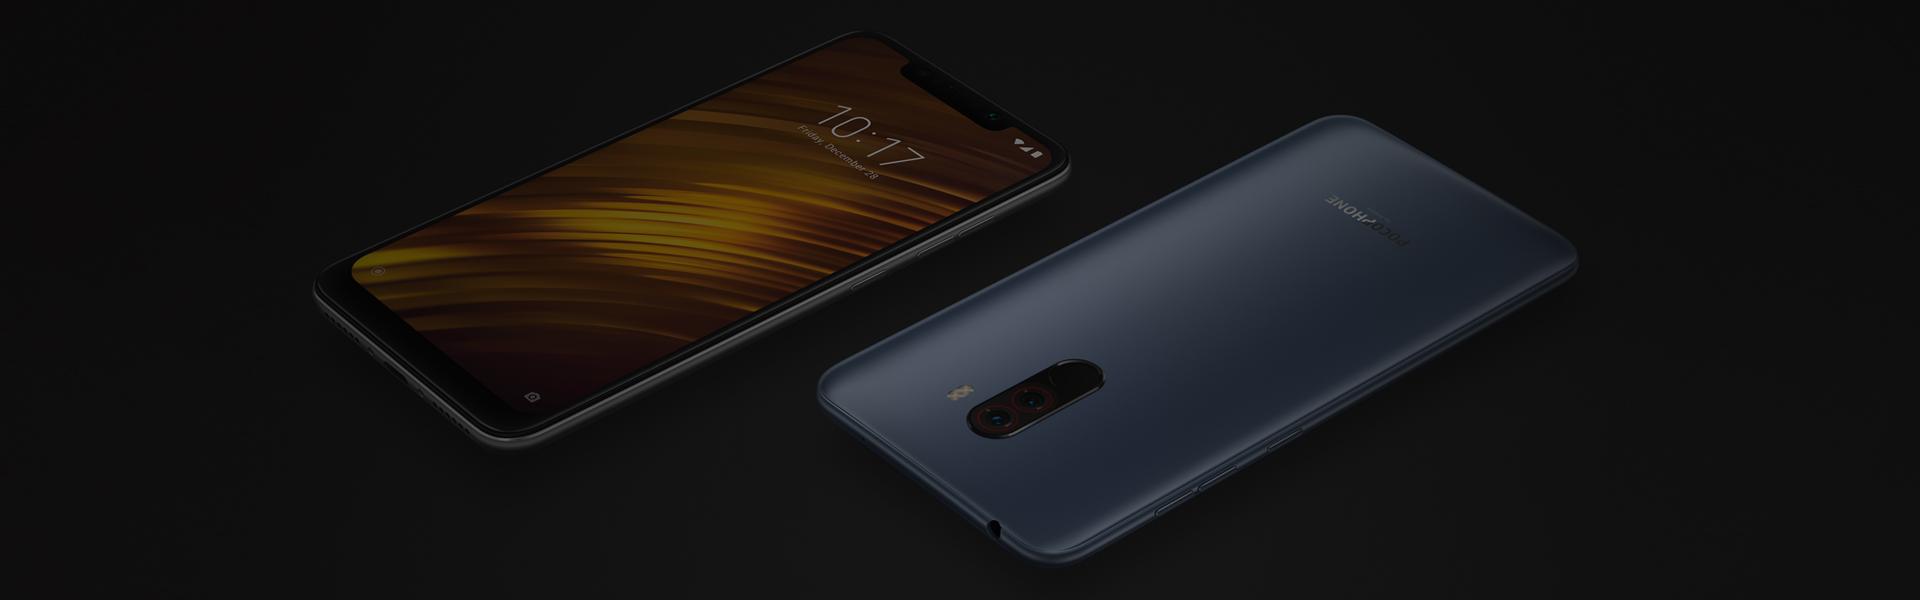 Recensione Xiaomi POCOPHONE F1: è lui il flagship killer